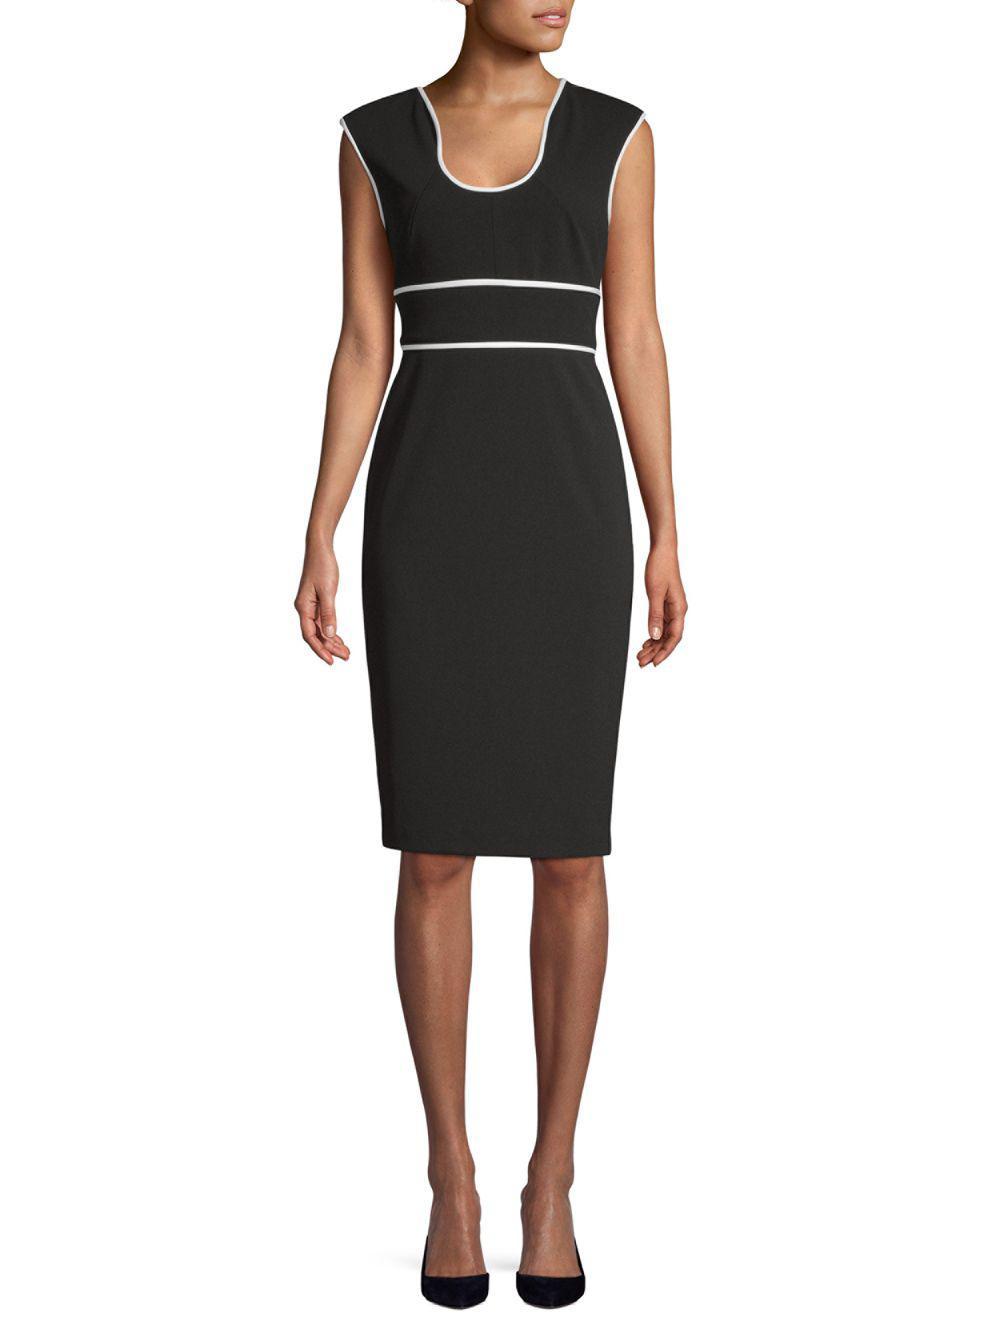 Calvin Klein Women S Black Contrast Trim Sheath Dress